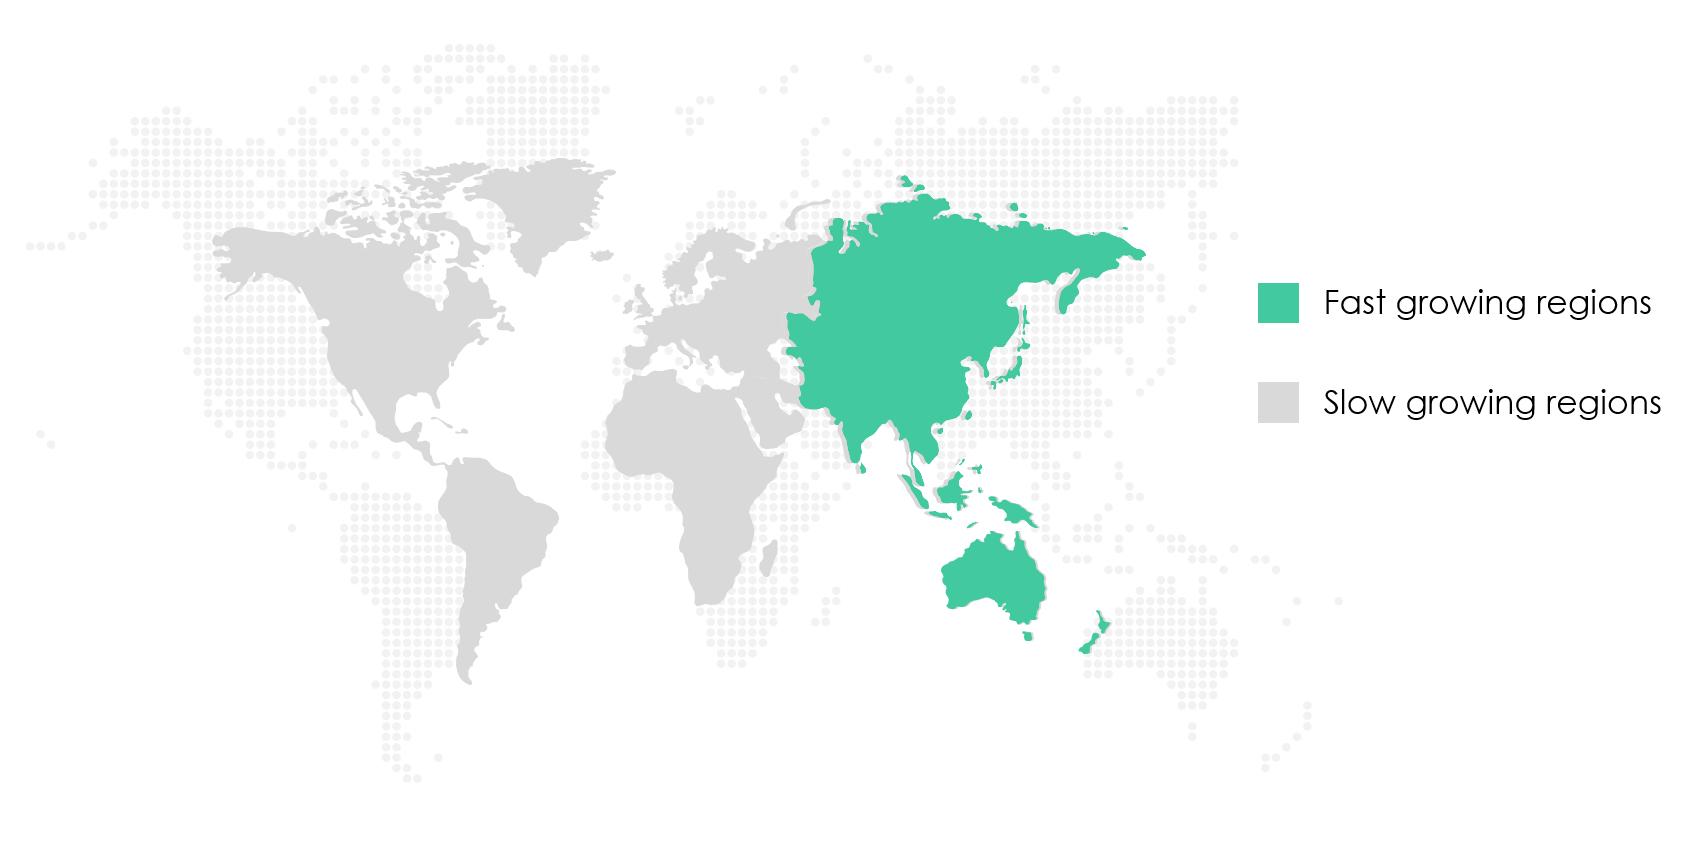 gin-market-share-by-region